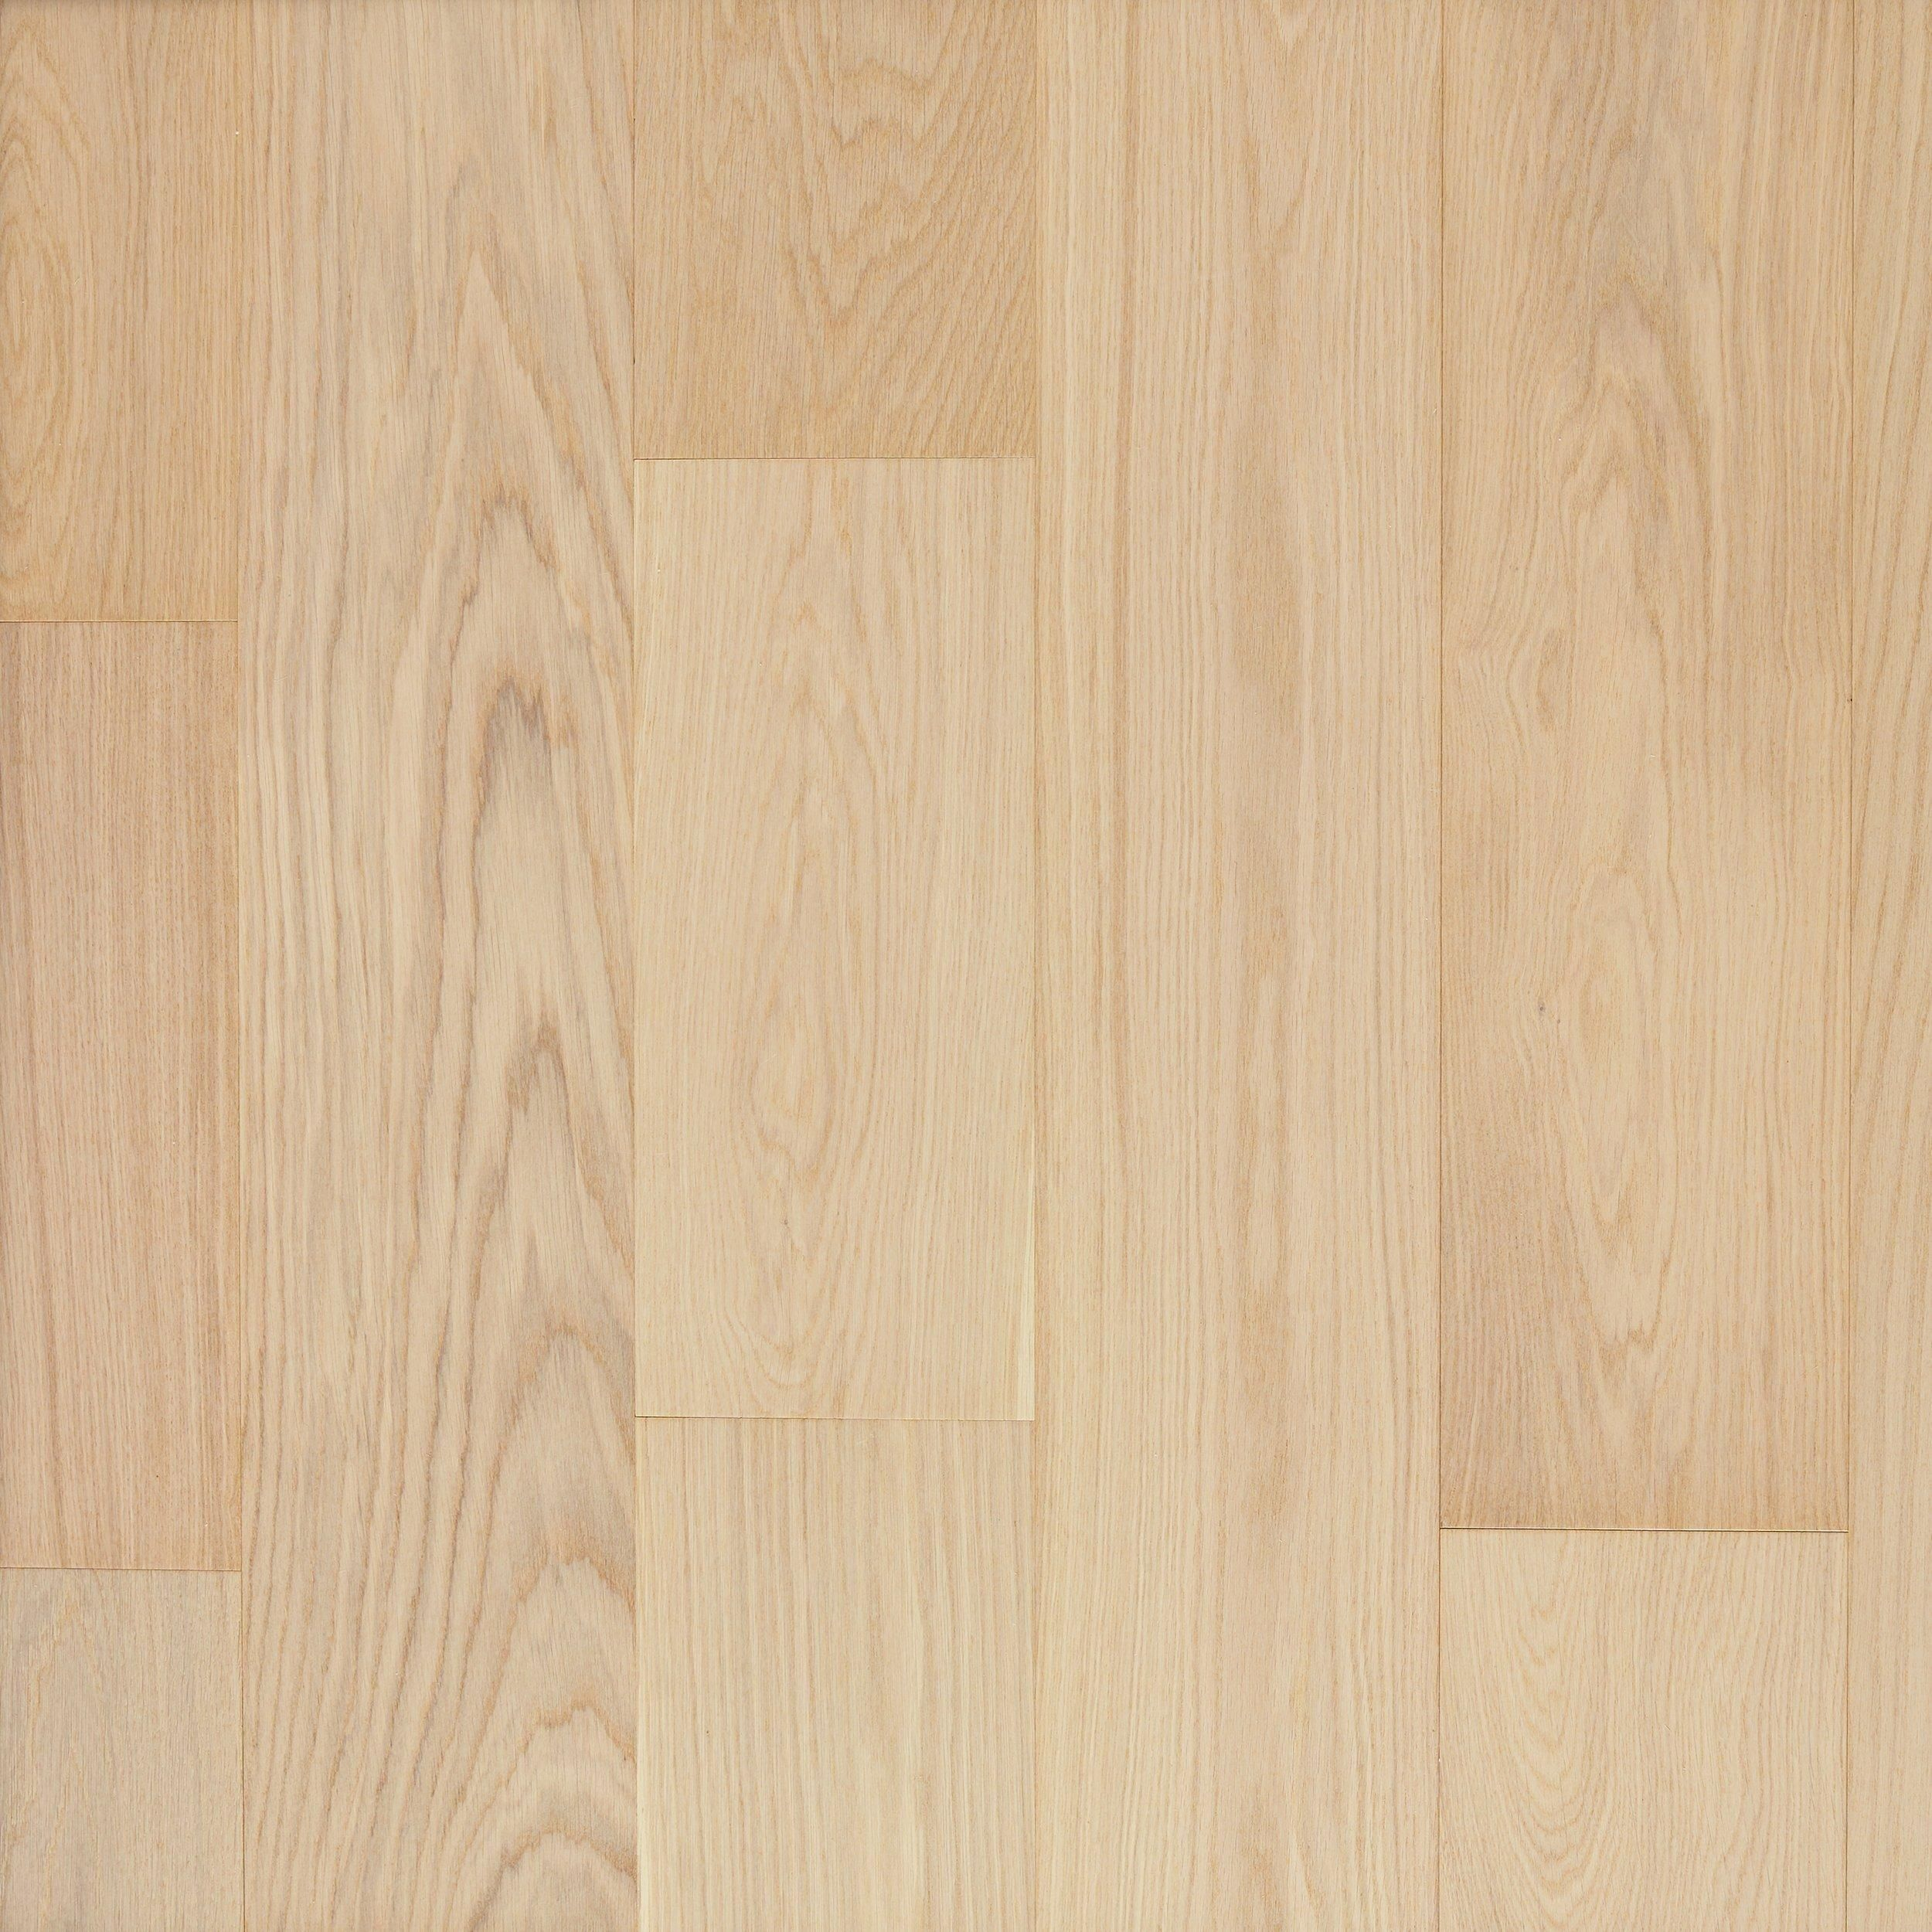 Marley European Oak Wire Brushed Engineered Hardwood In 2020 Engineered Hardwood Hardwood Engineered Timber Flooring